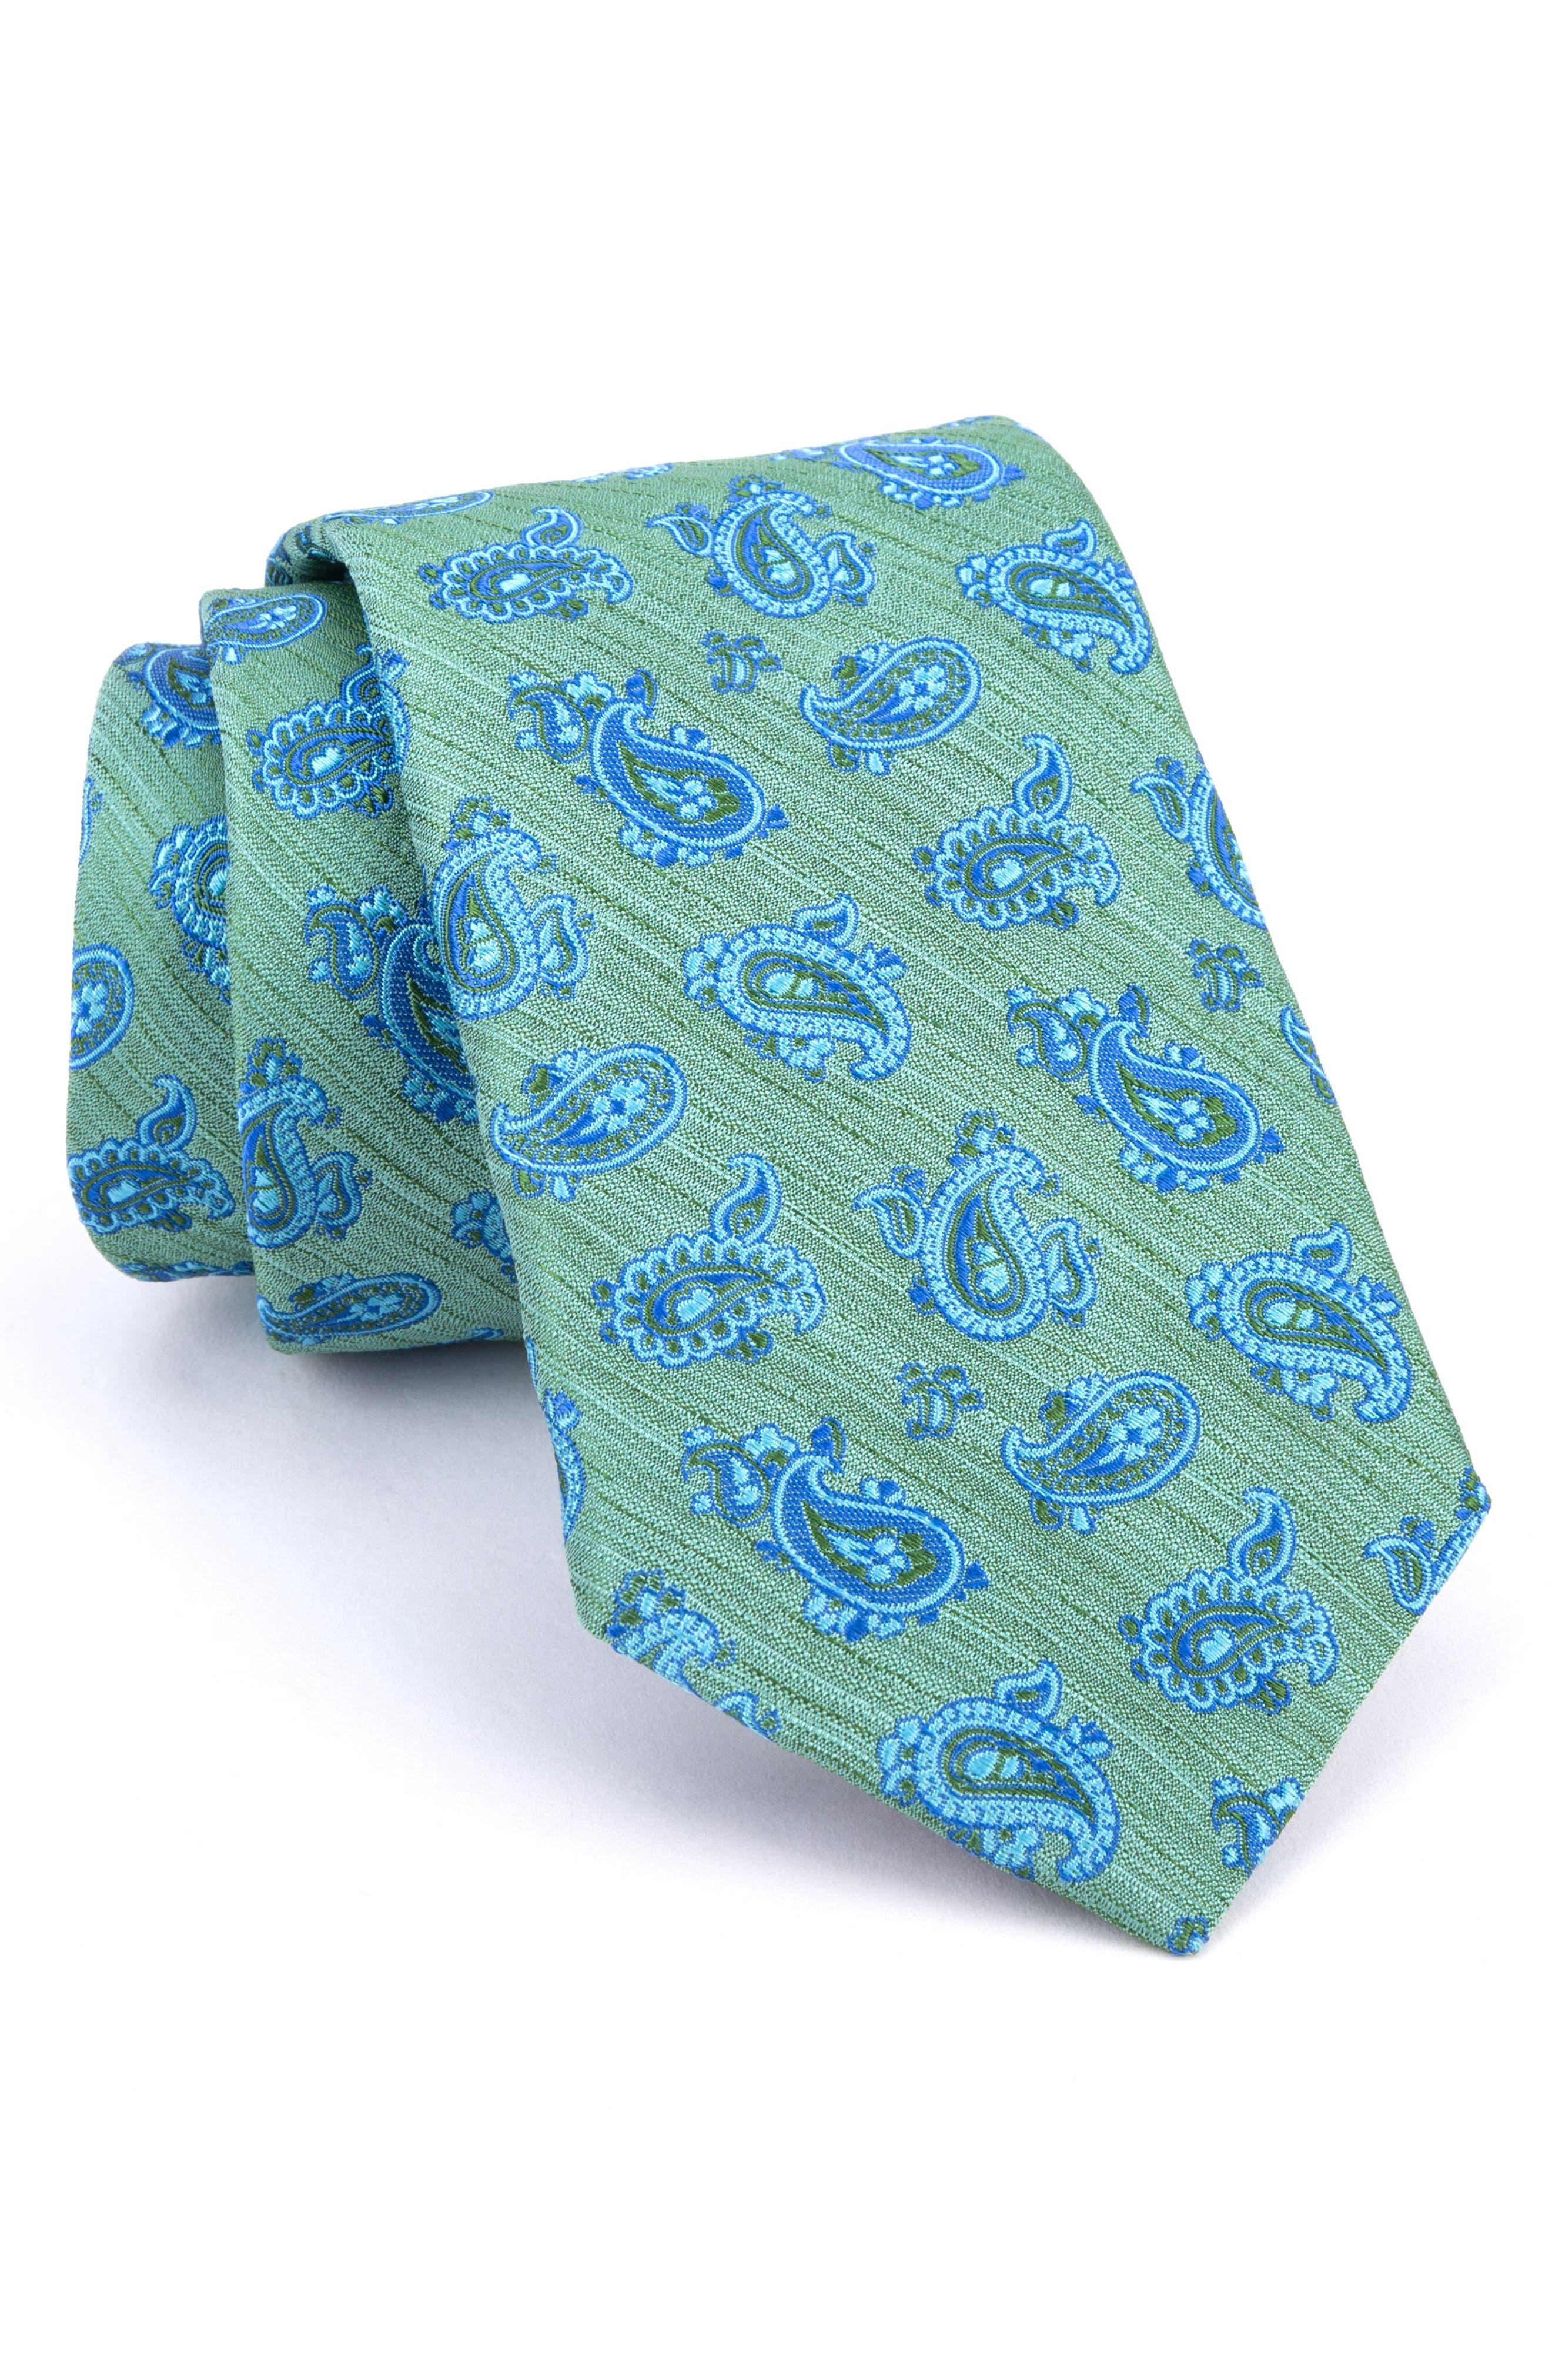 Marvelous Paisley Silk Tie,                         Main,                         color,